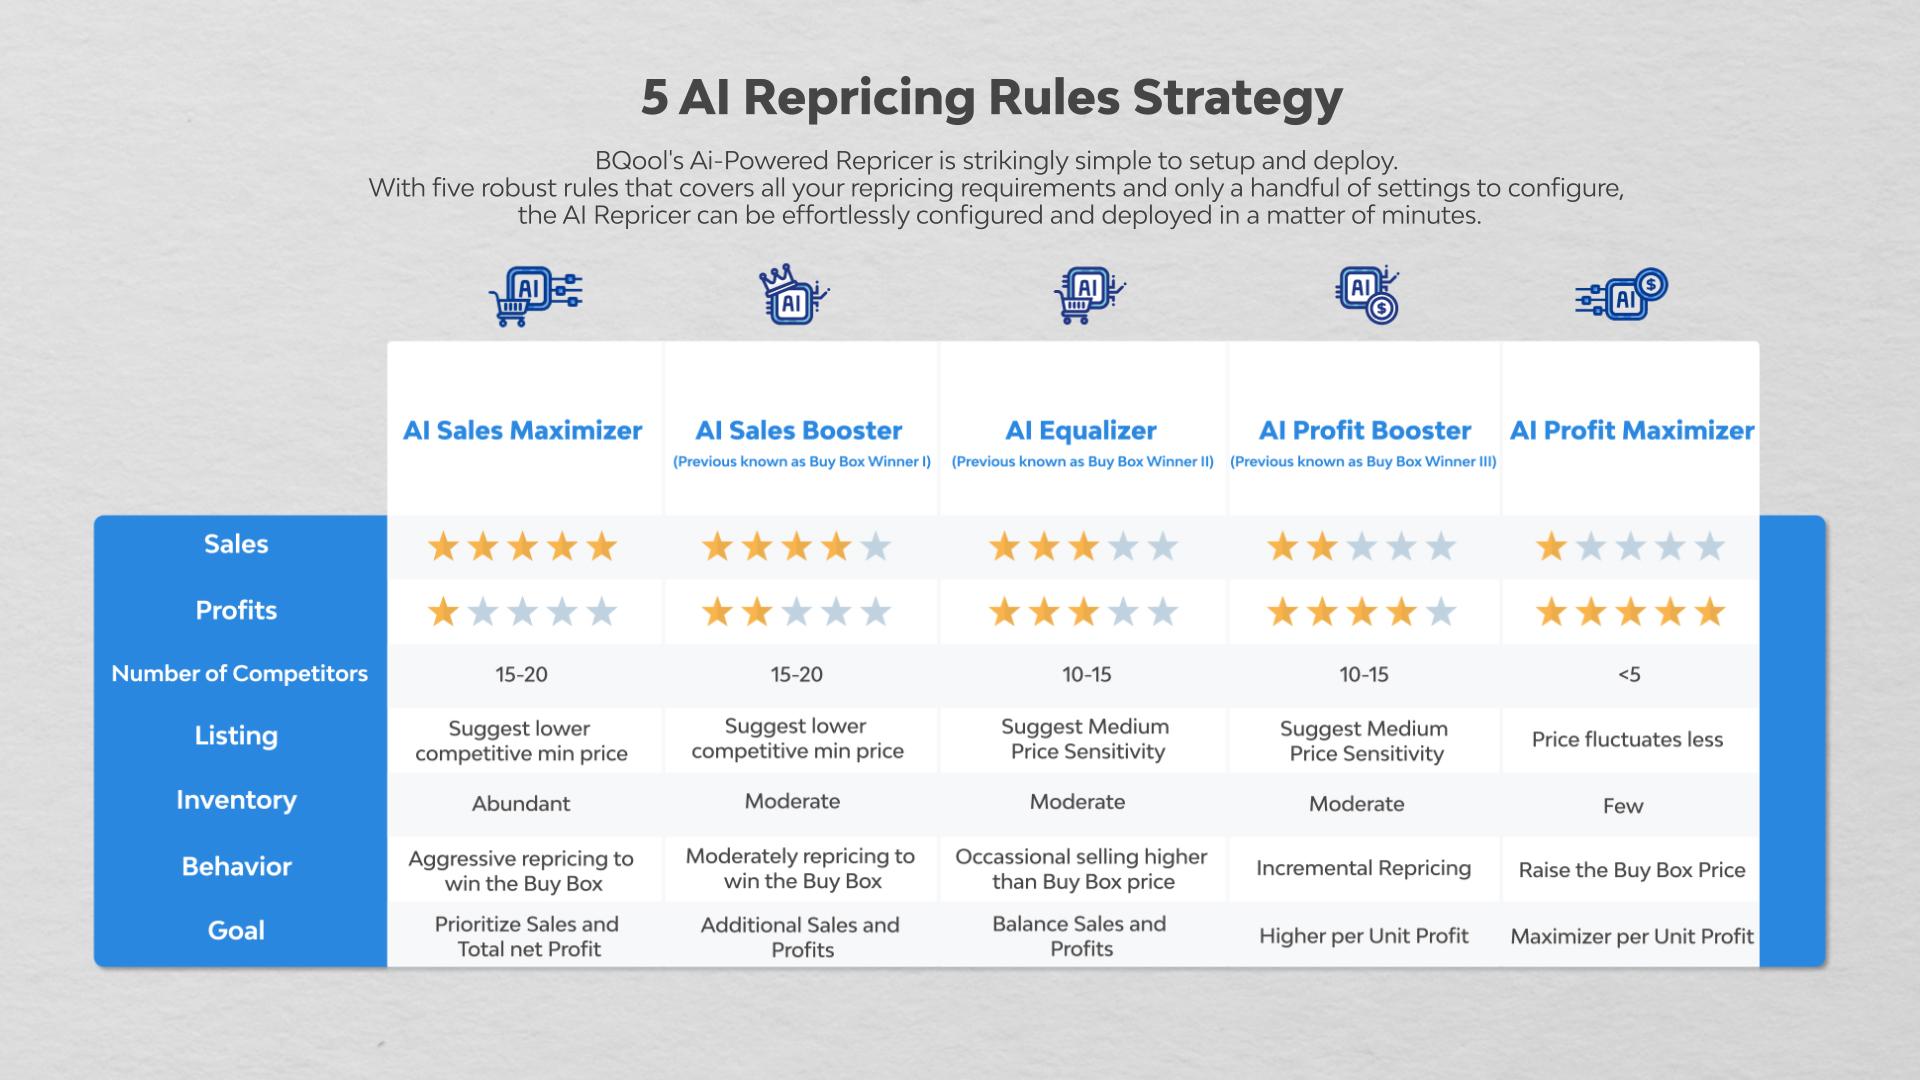 BQool 5 AI Repricing Strategies